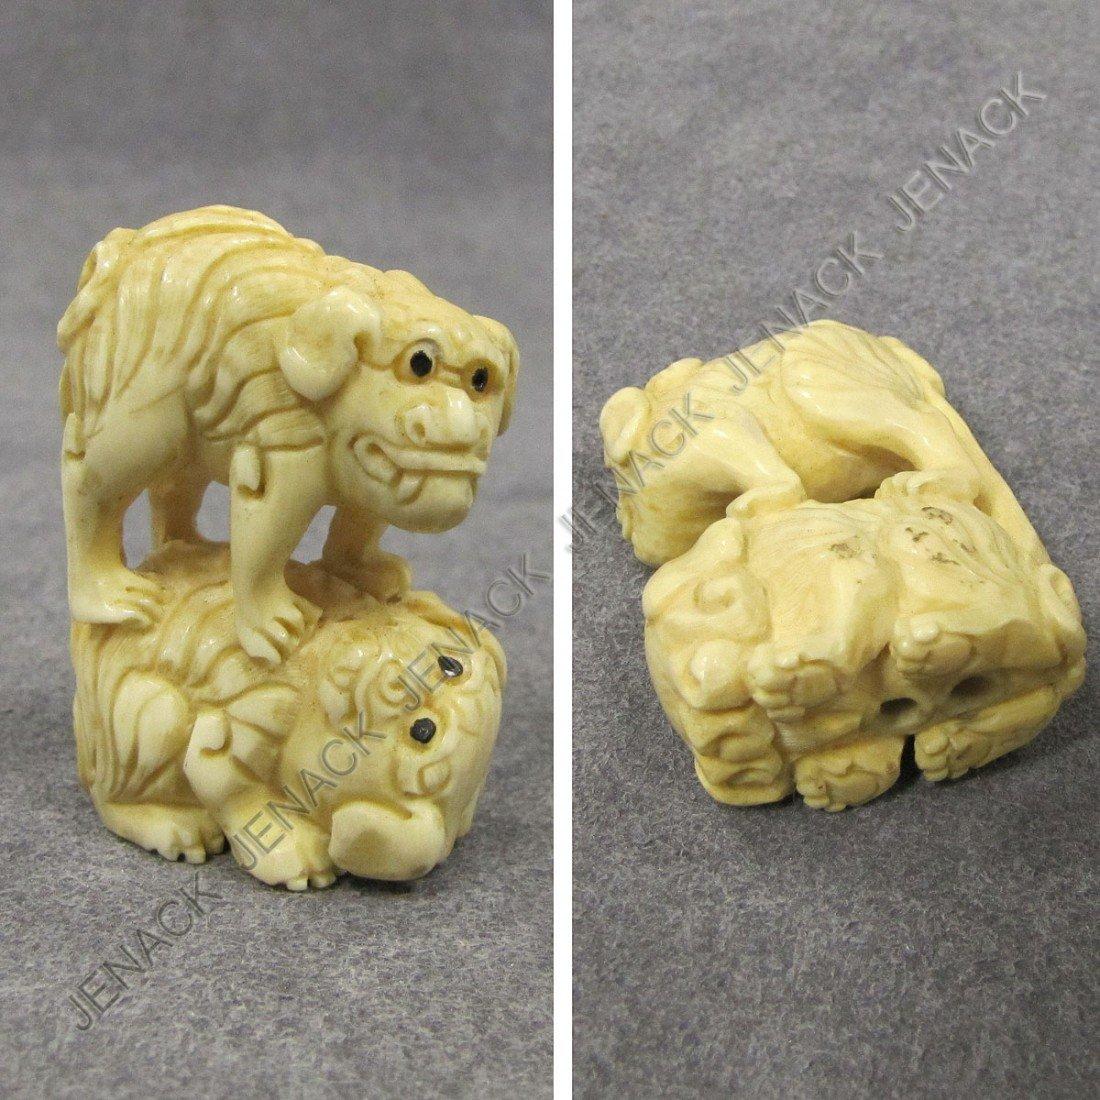 117: JAPANESE CARVED IVORY NETSUKE OF DOGS